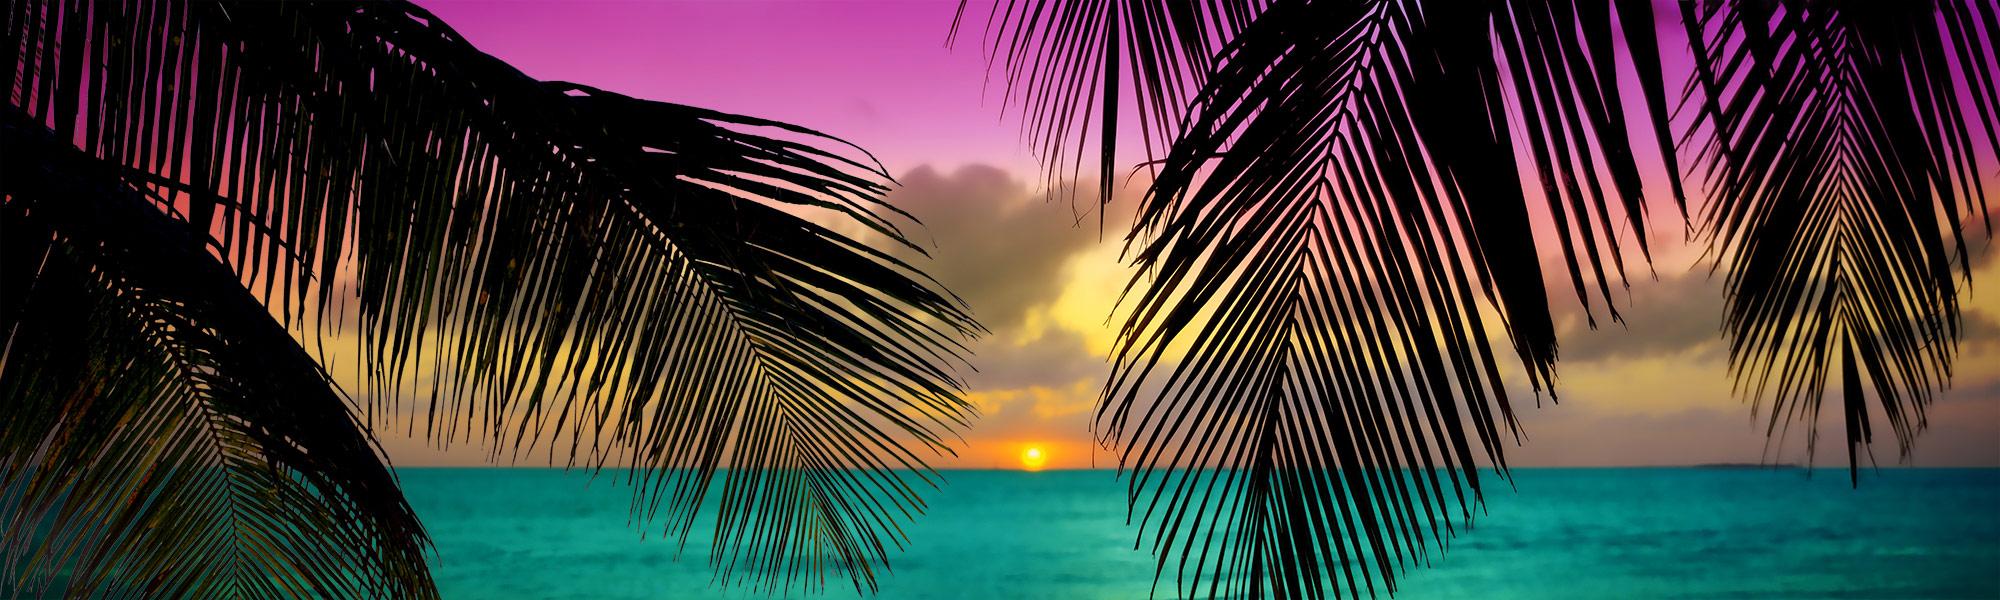 Purple sky sunset through palm fronds